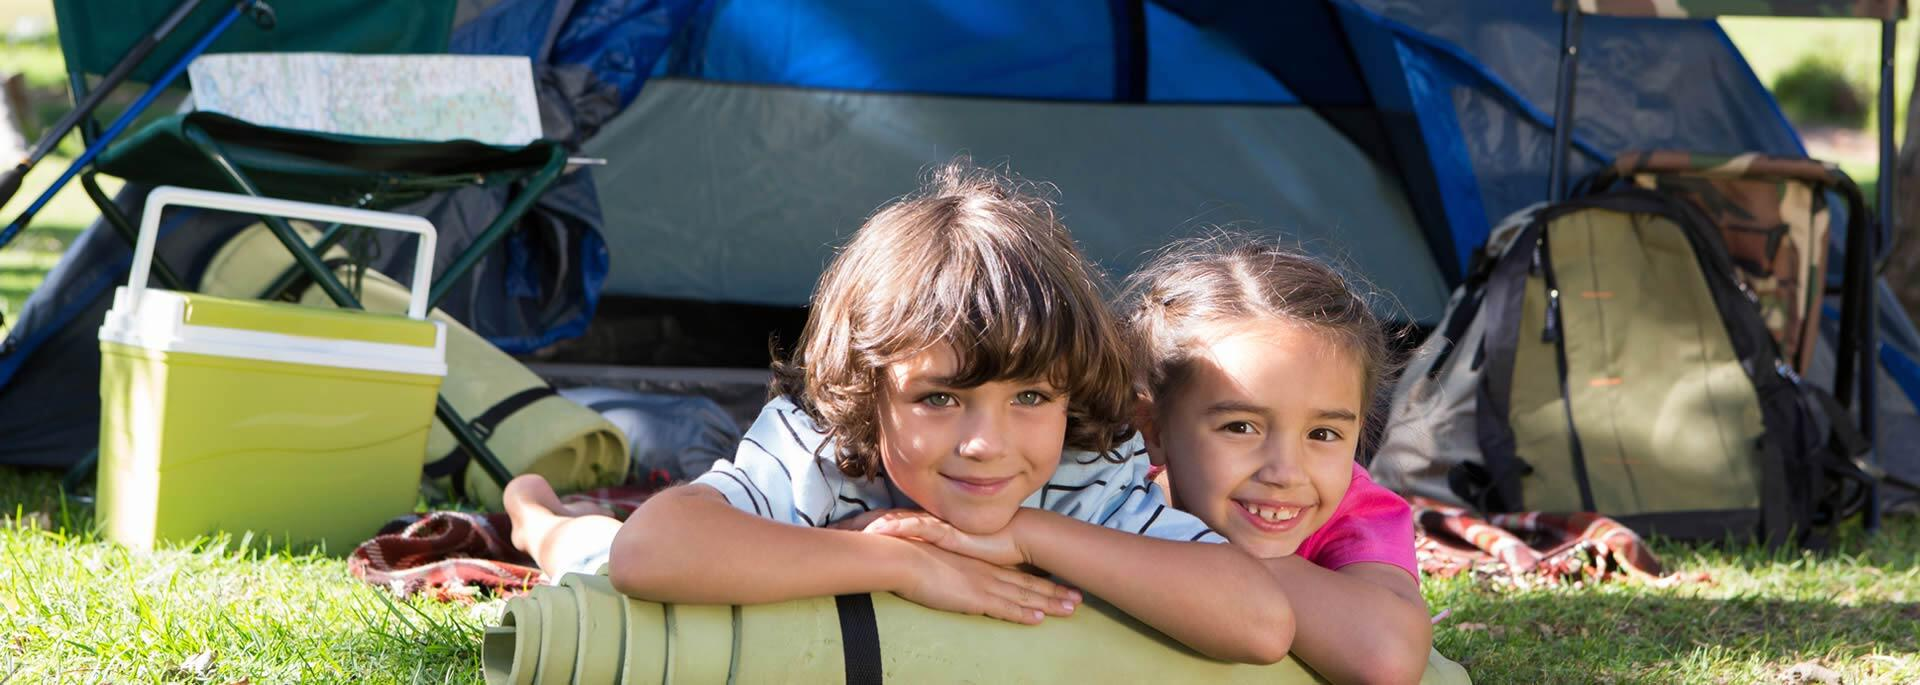 camping-tavolara de kontakte 001